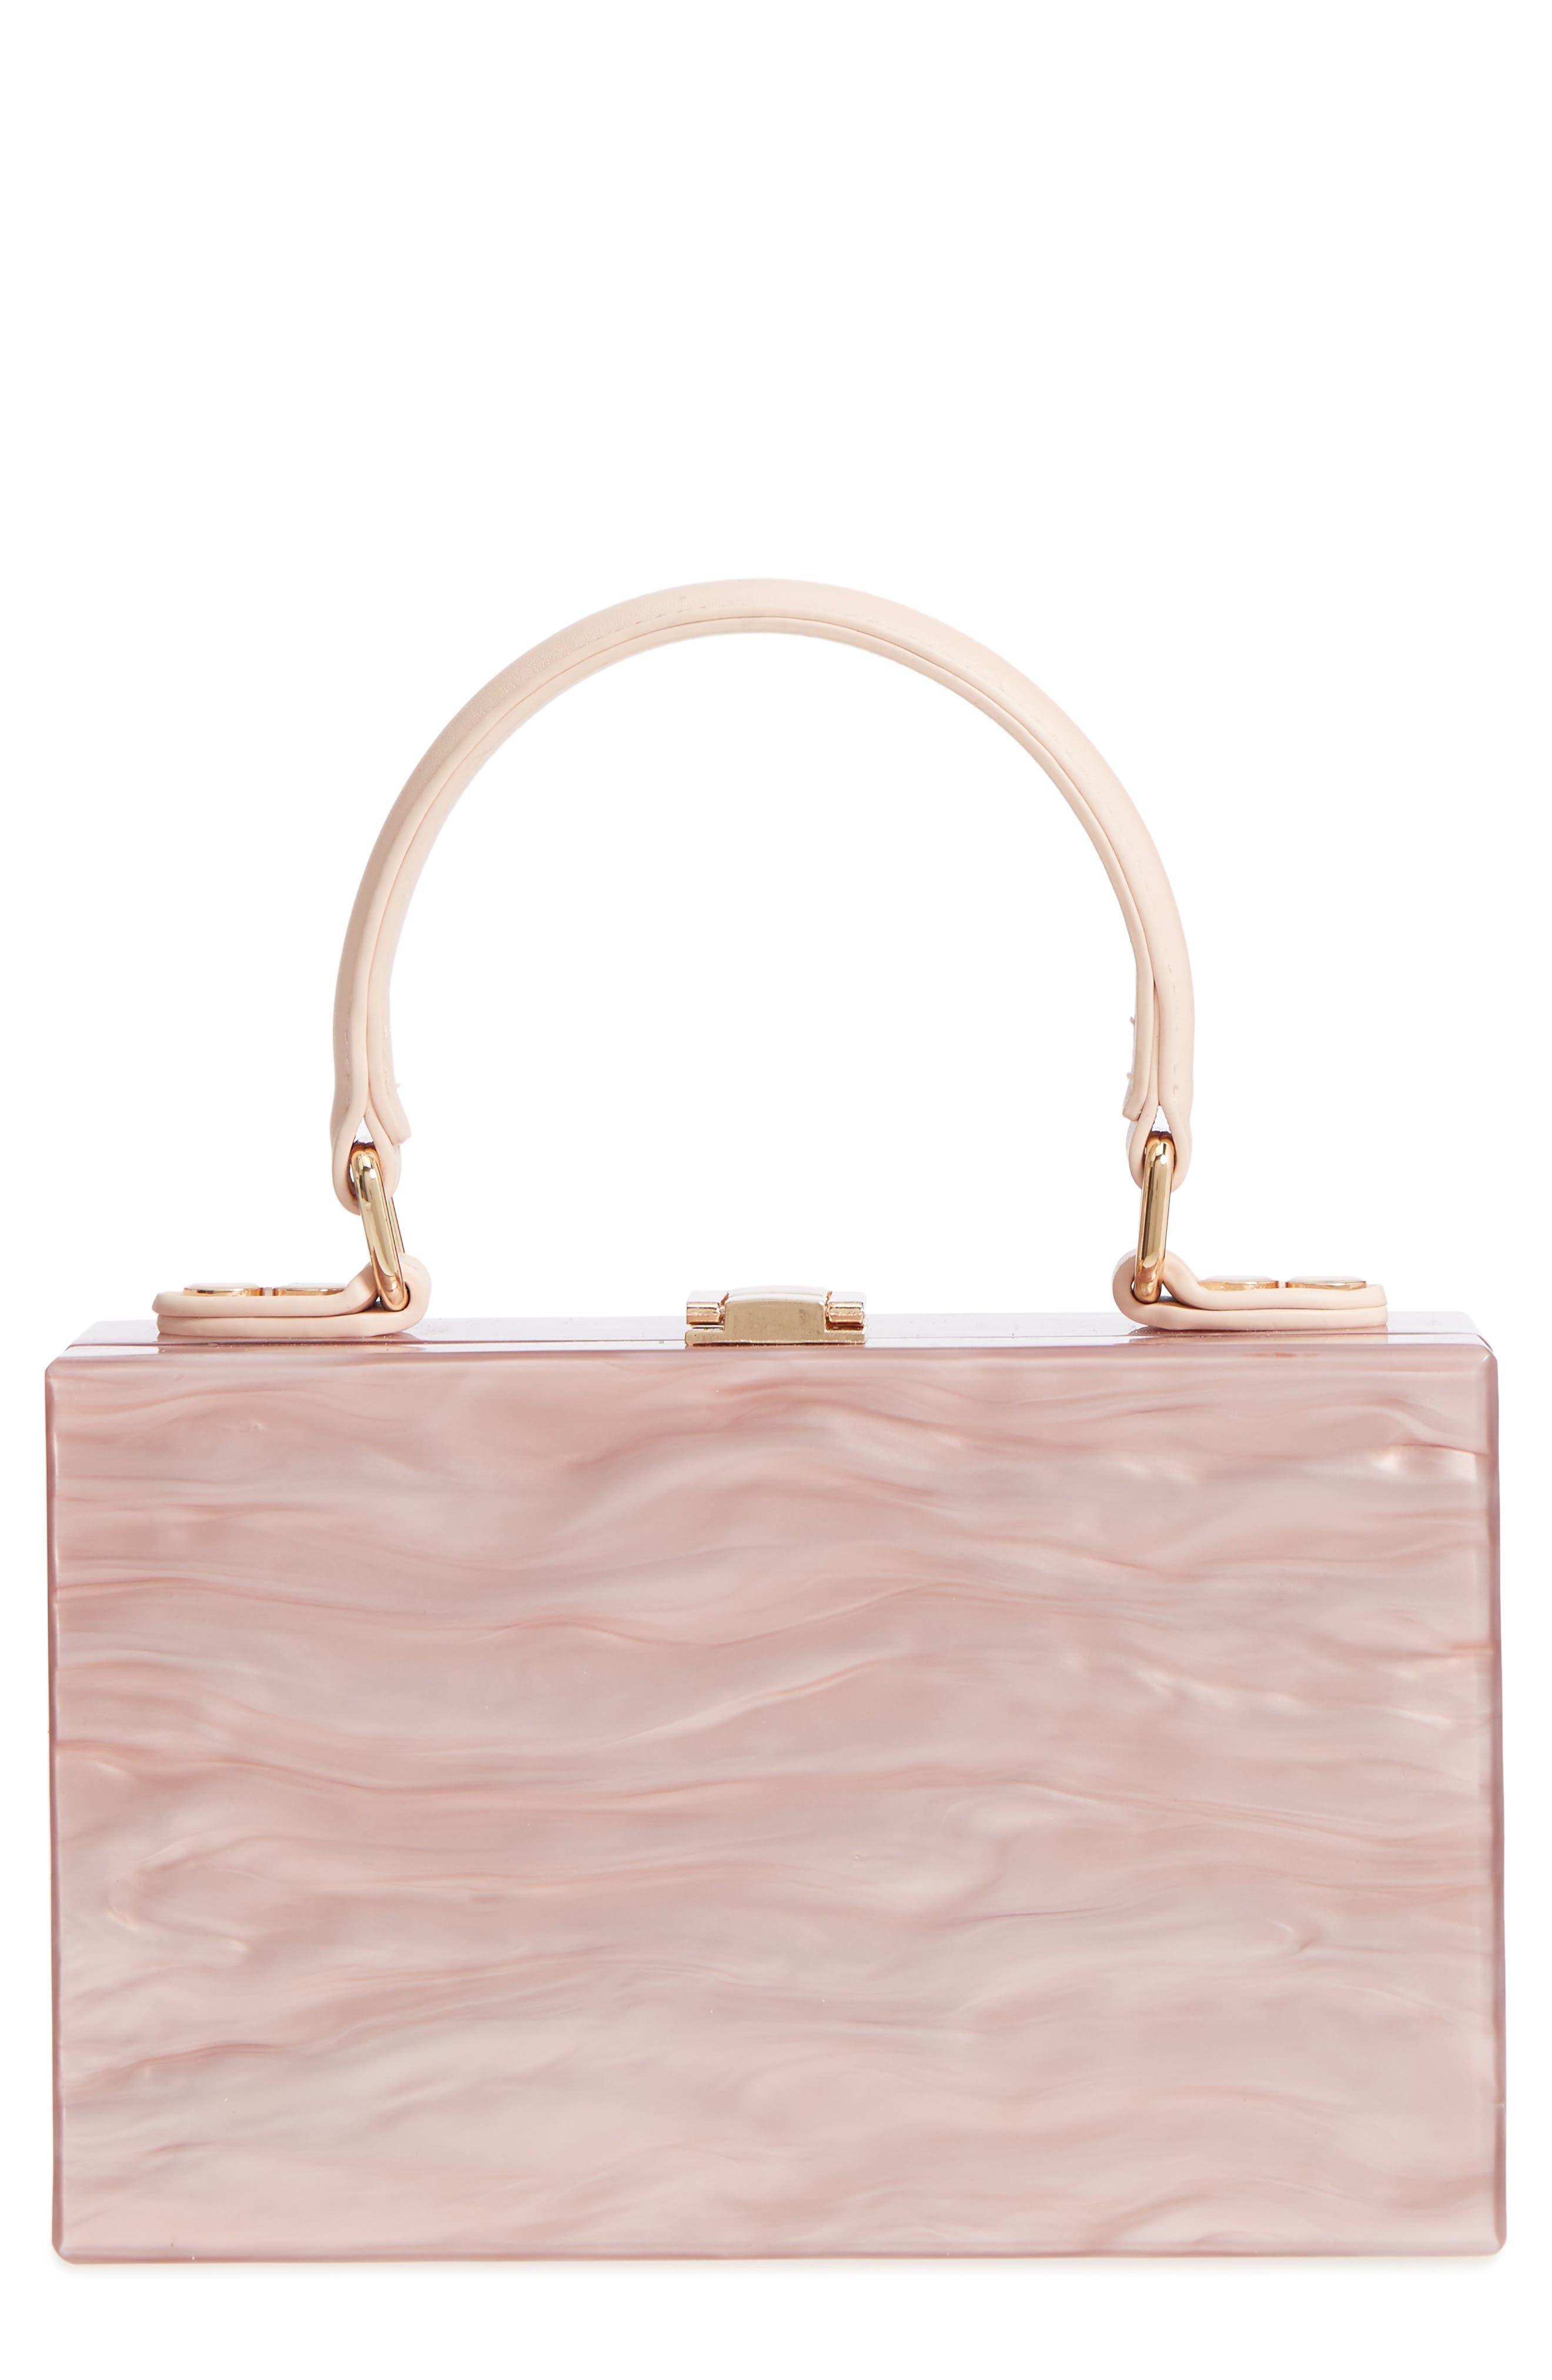 Clara Top Handle Box Clutch,                             Main thumbnail 1, color,                             Pink